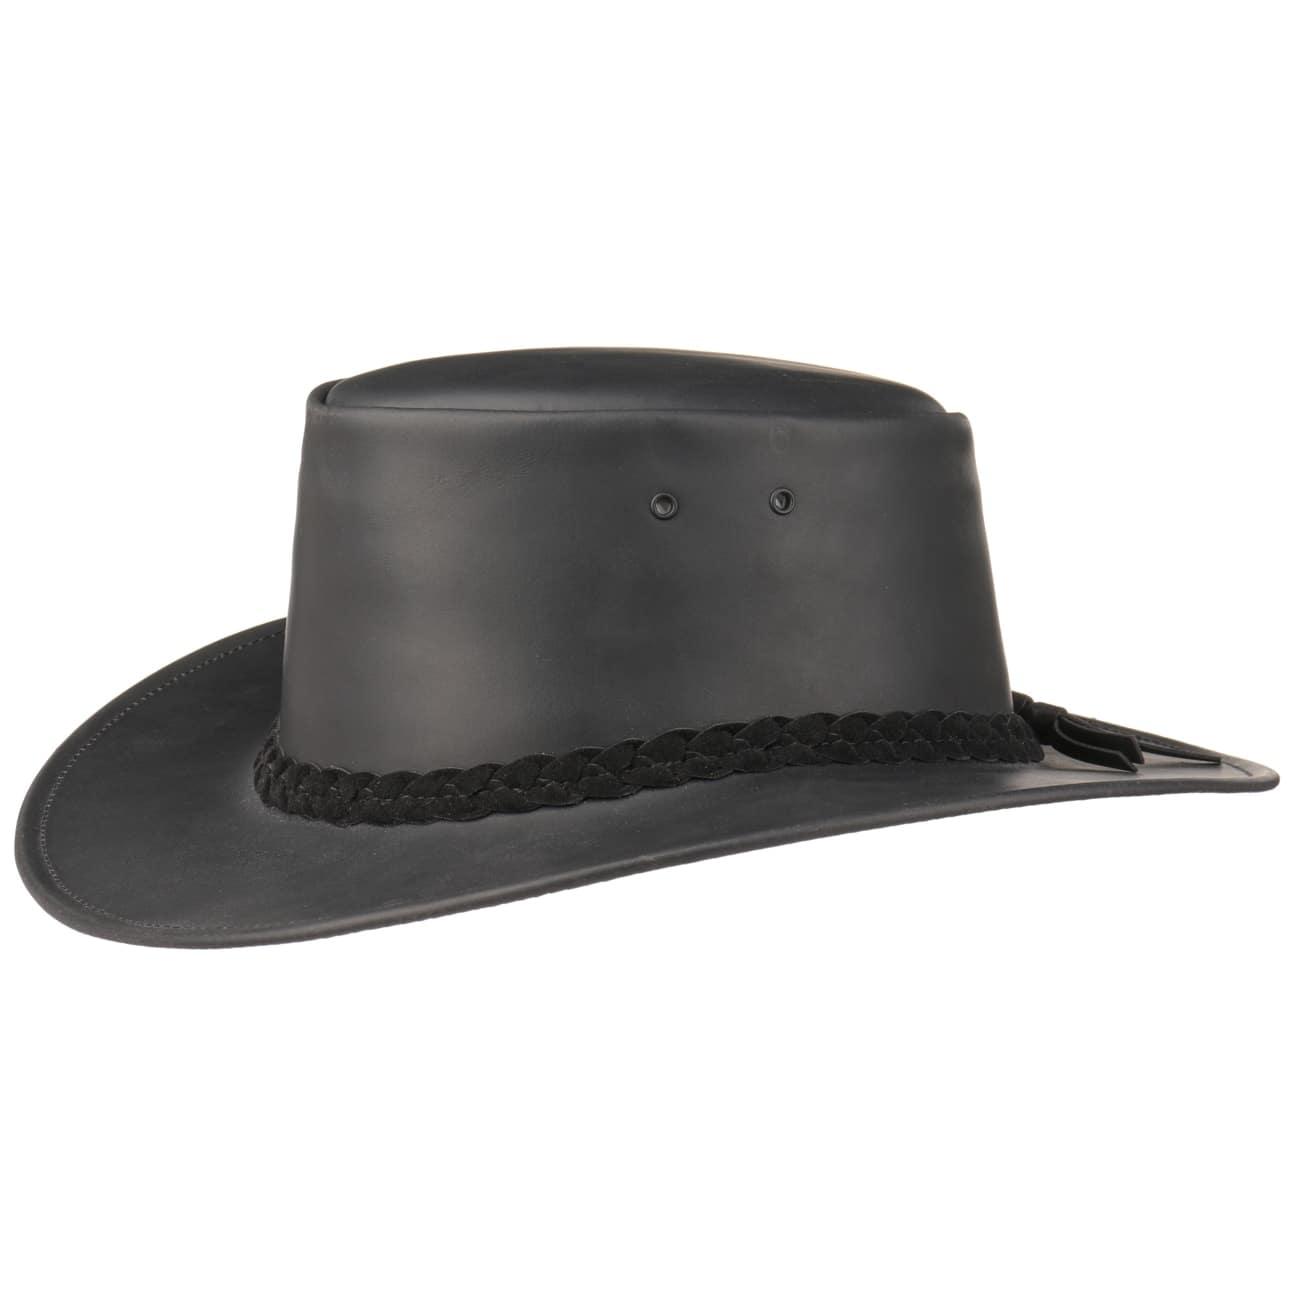 Sombrero Piel Colonial by Kakadu Traders  sombrero outback